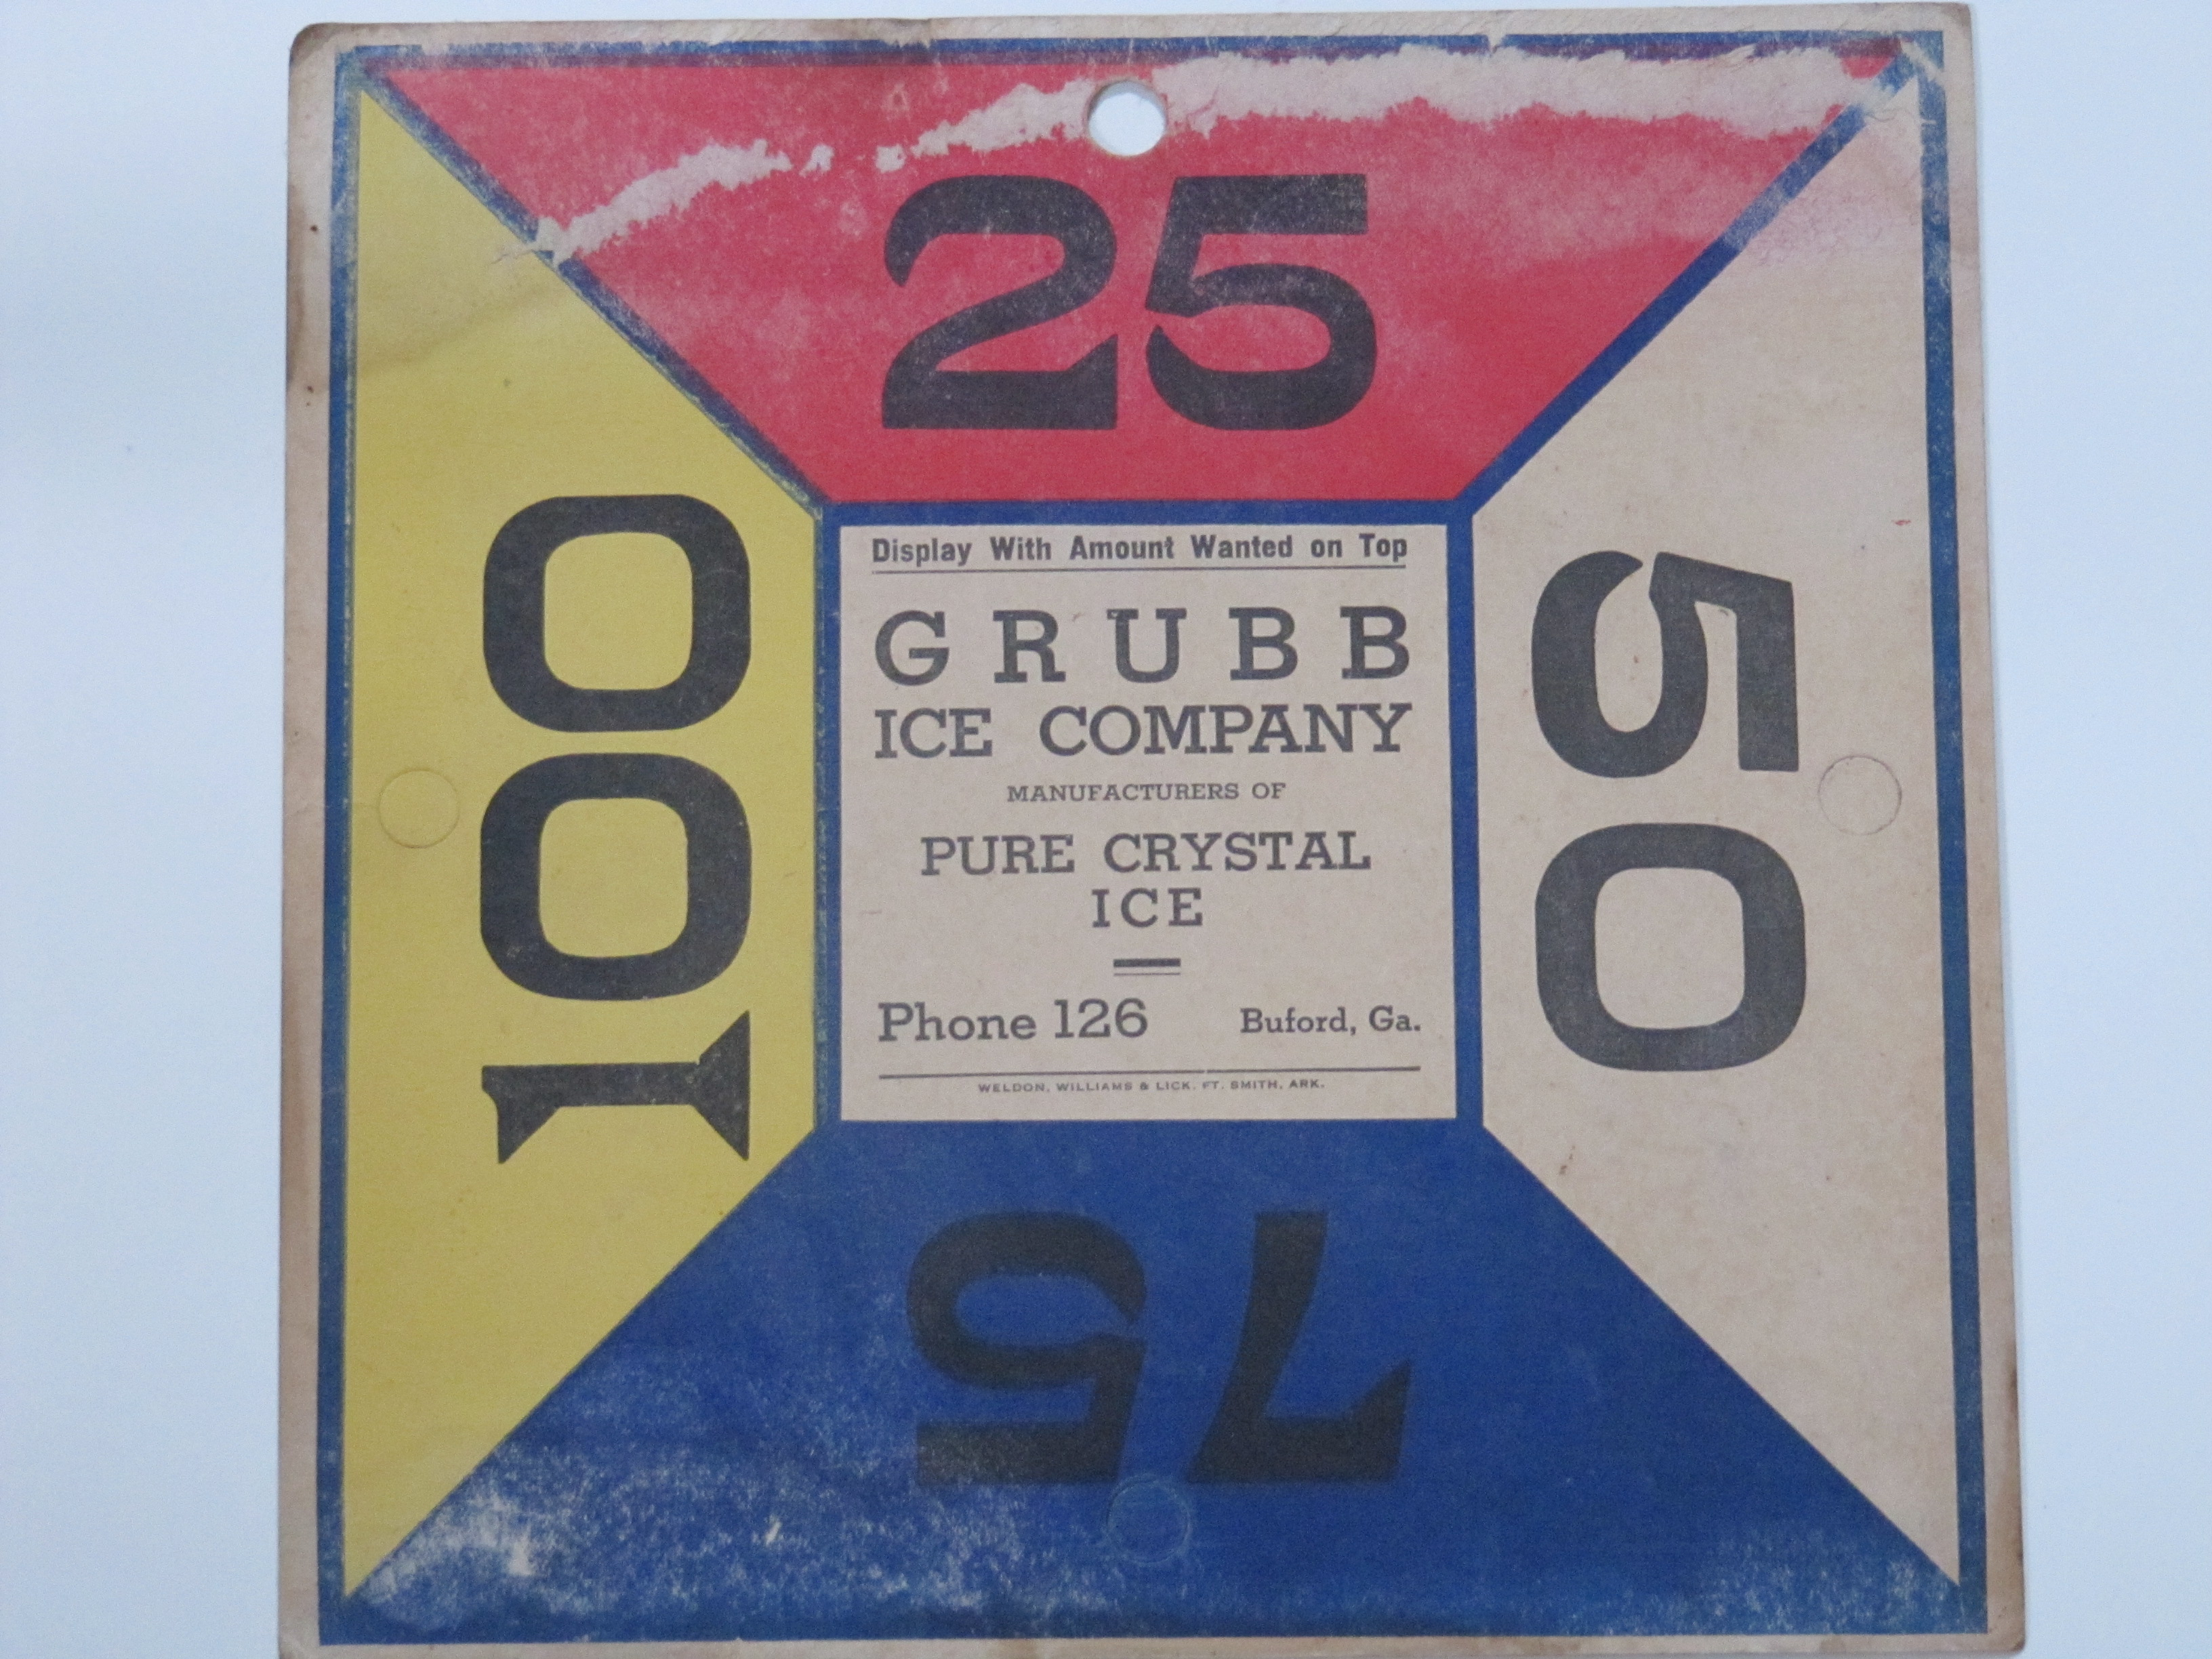 Grubb Ice Co.